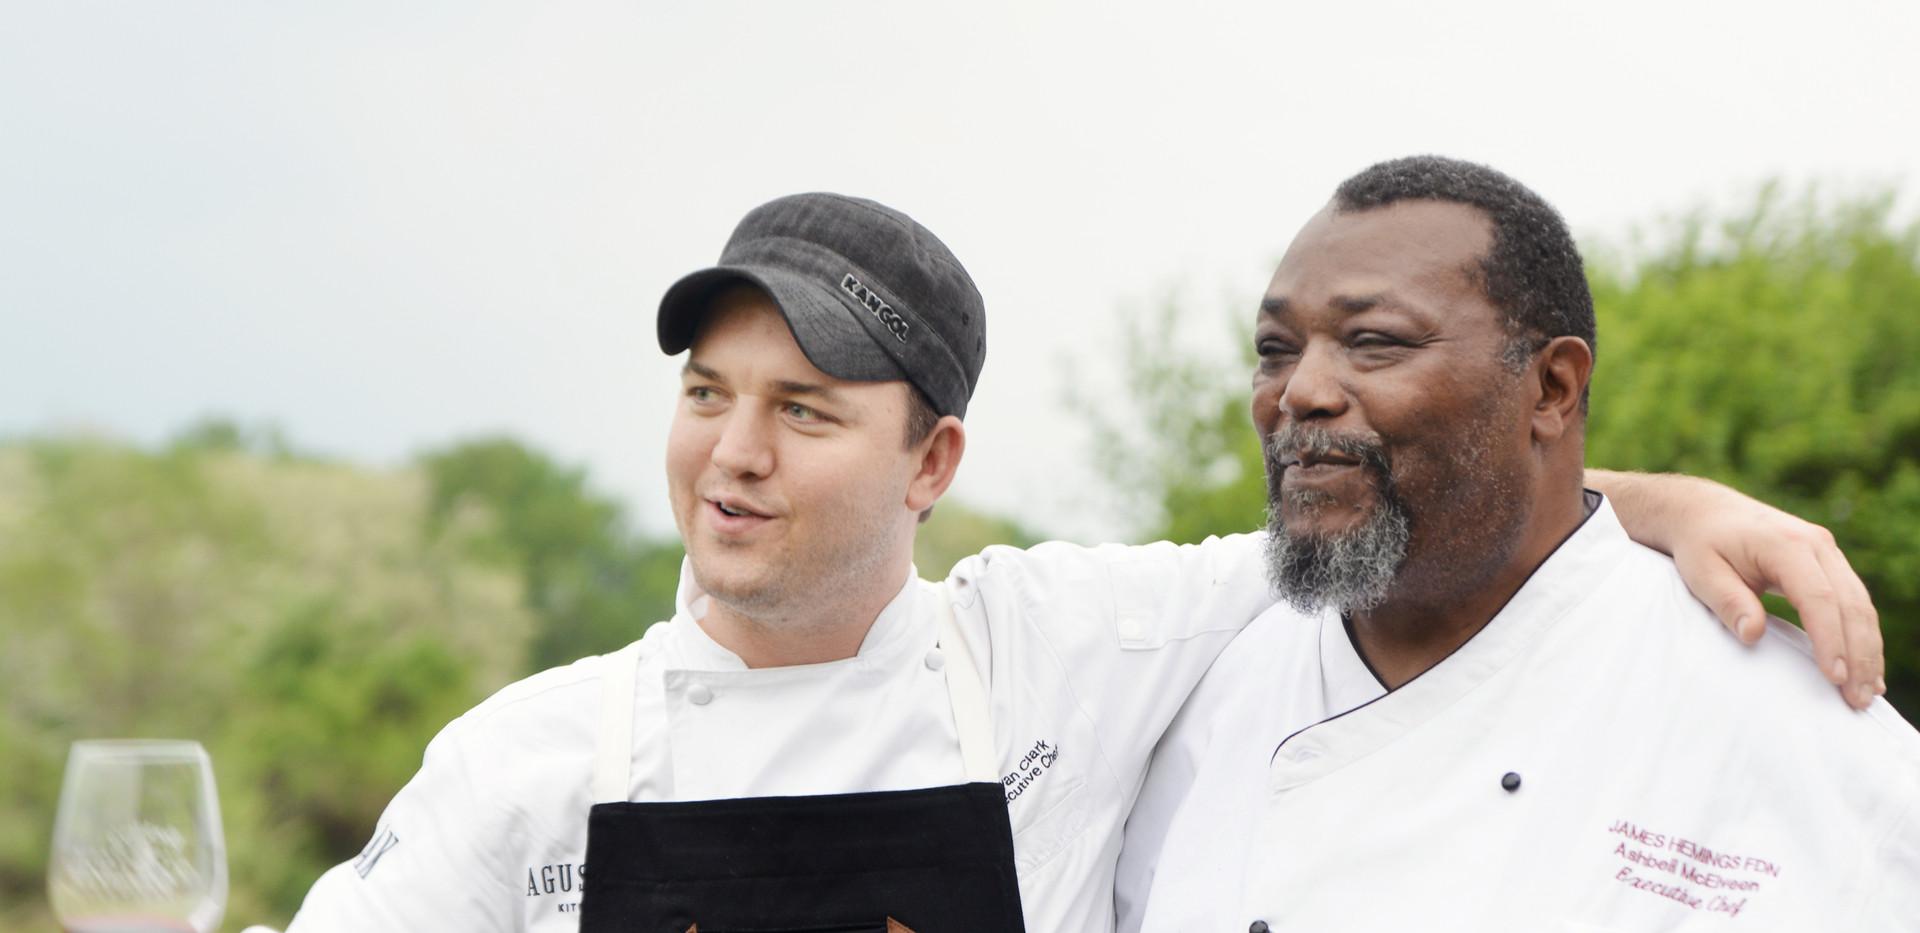 Chefs Ryan and Ashbell.jpg